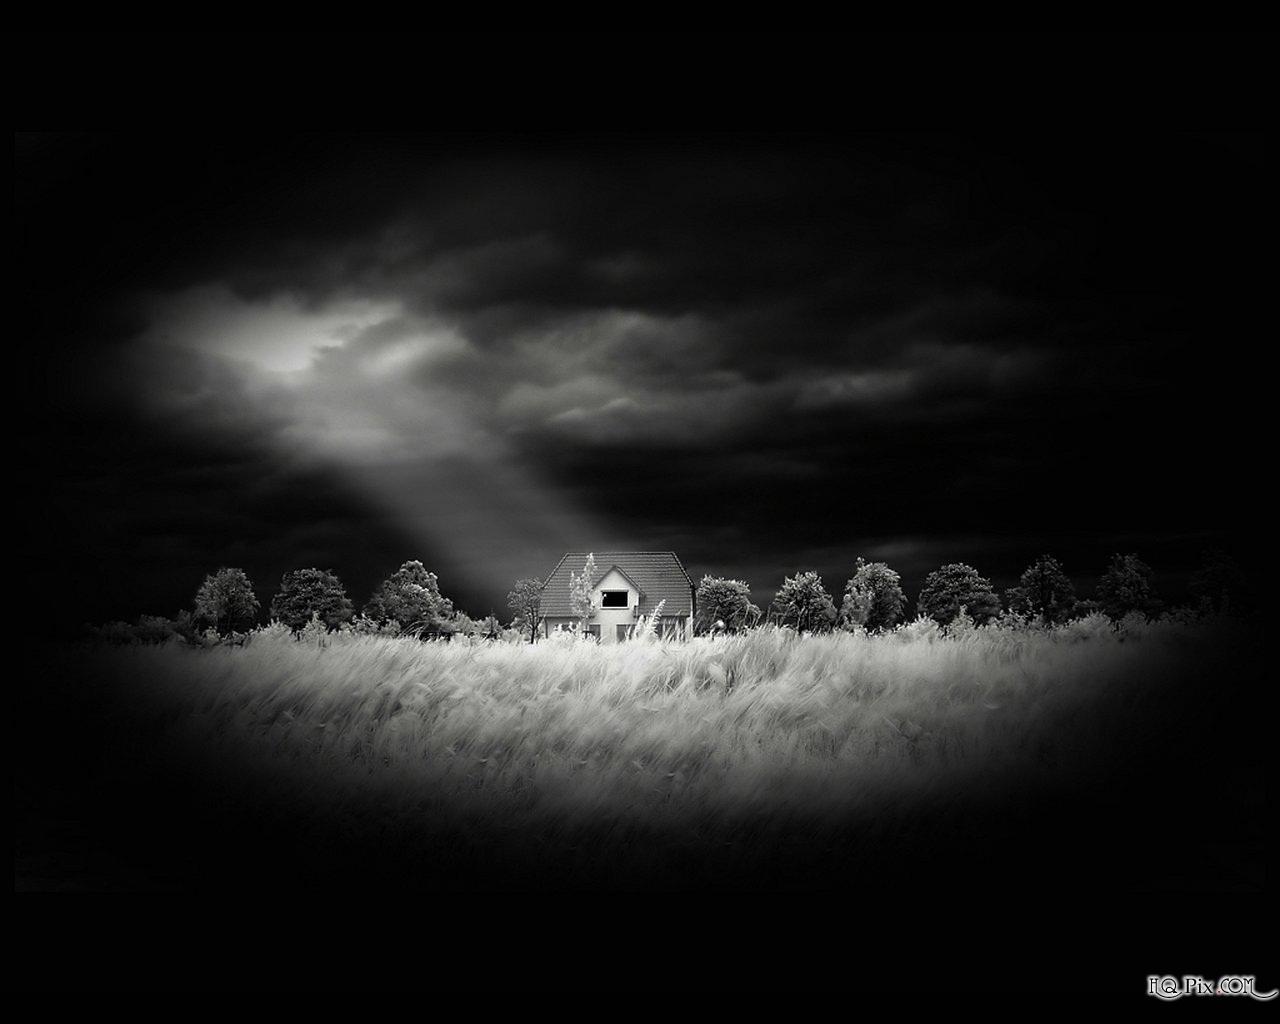 Nature Black and White Wallpaper   Webgranth 2015 1280x1024